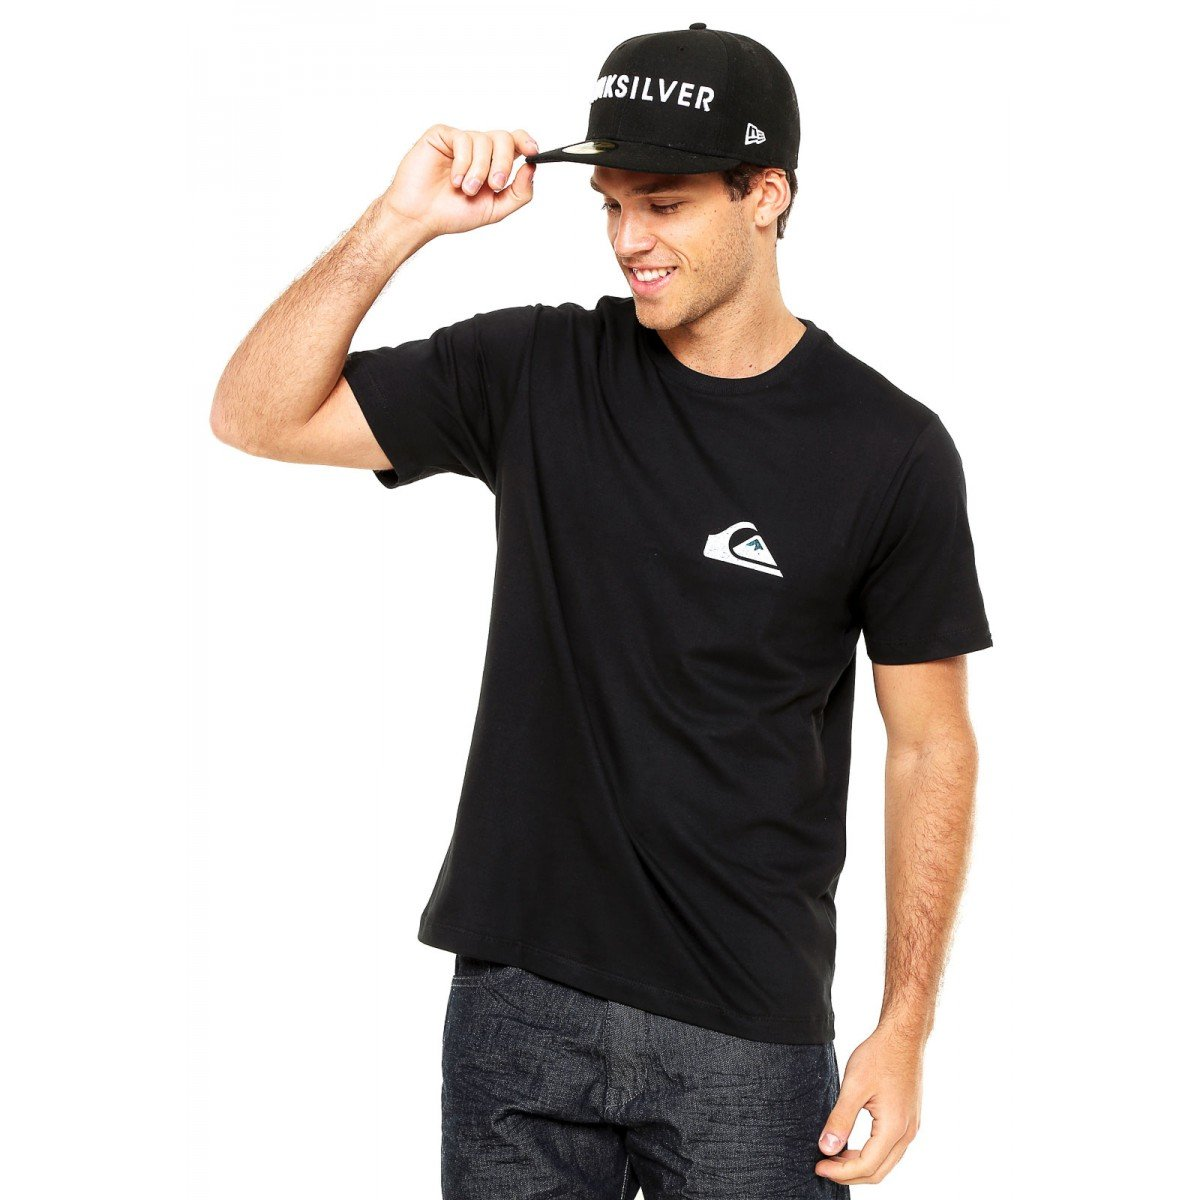 Camiseta Quiksilver Water Tank - Preta